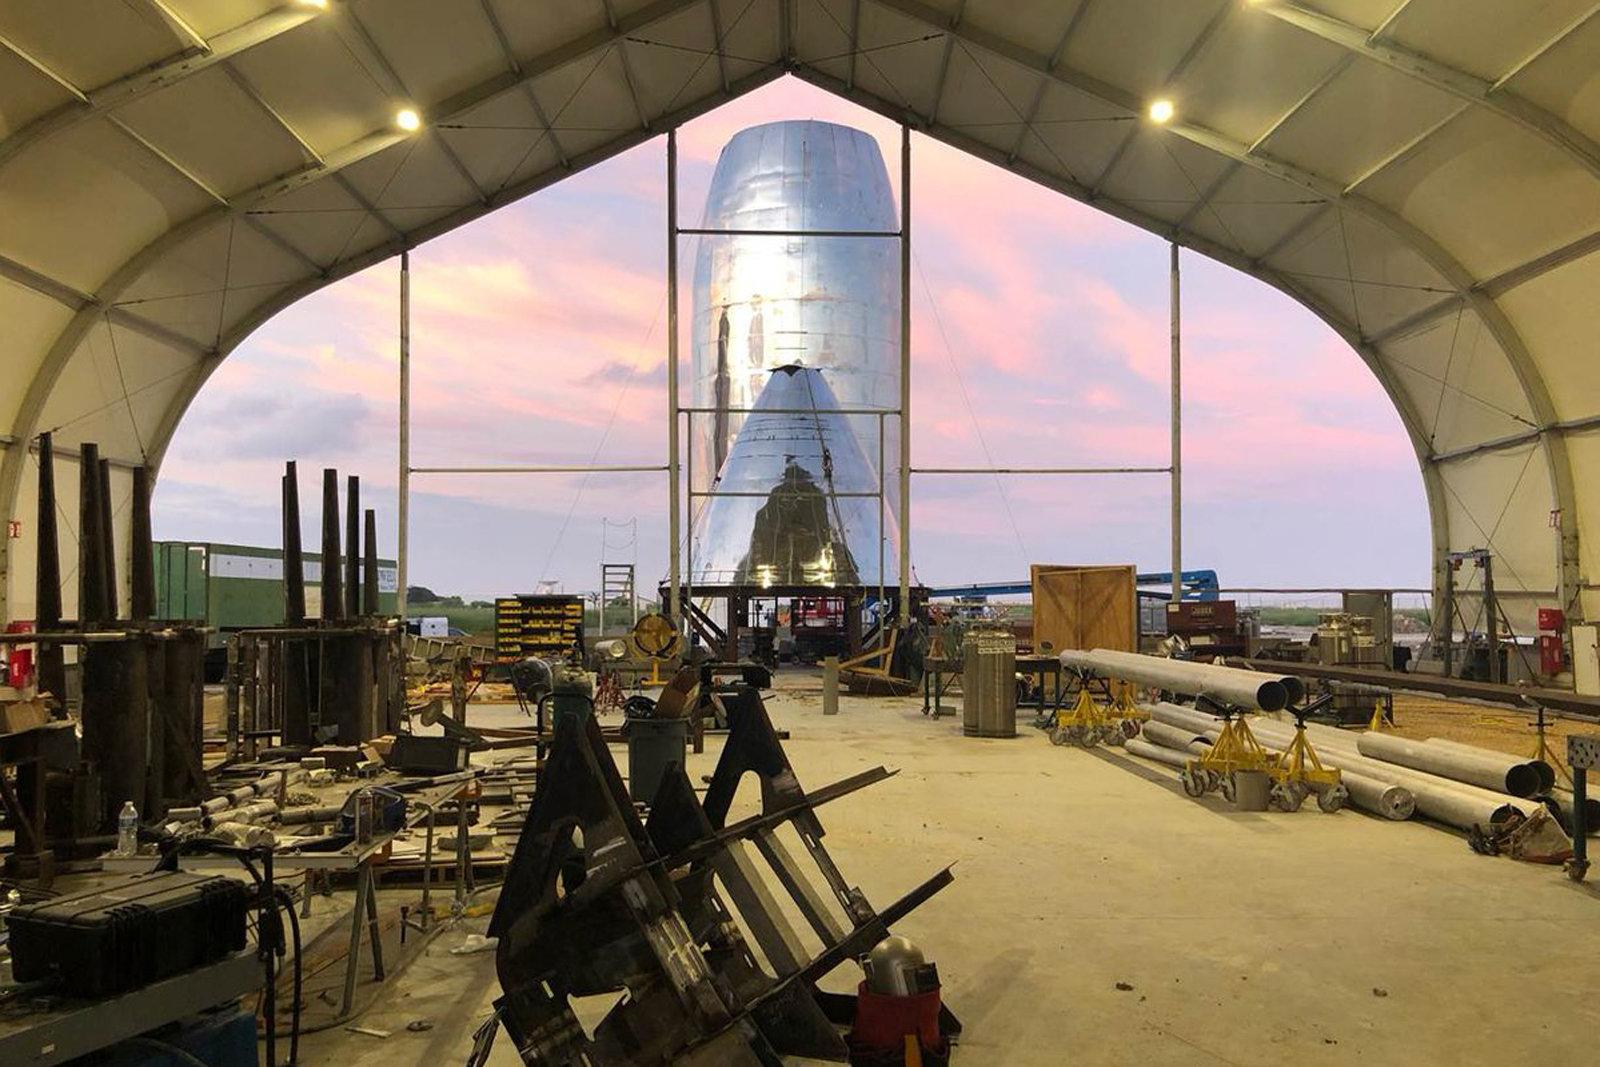 SpaceX, Илон Маск, Starship, Испытания, Запуск, Космос, Наука, Техника, США, СМИ